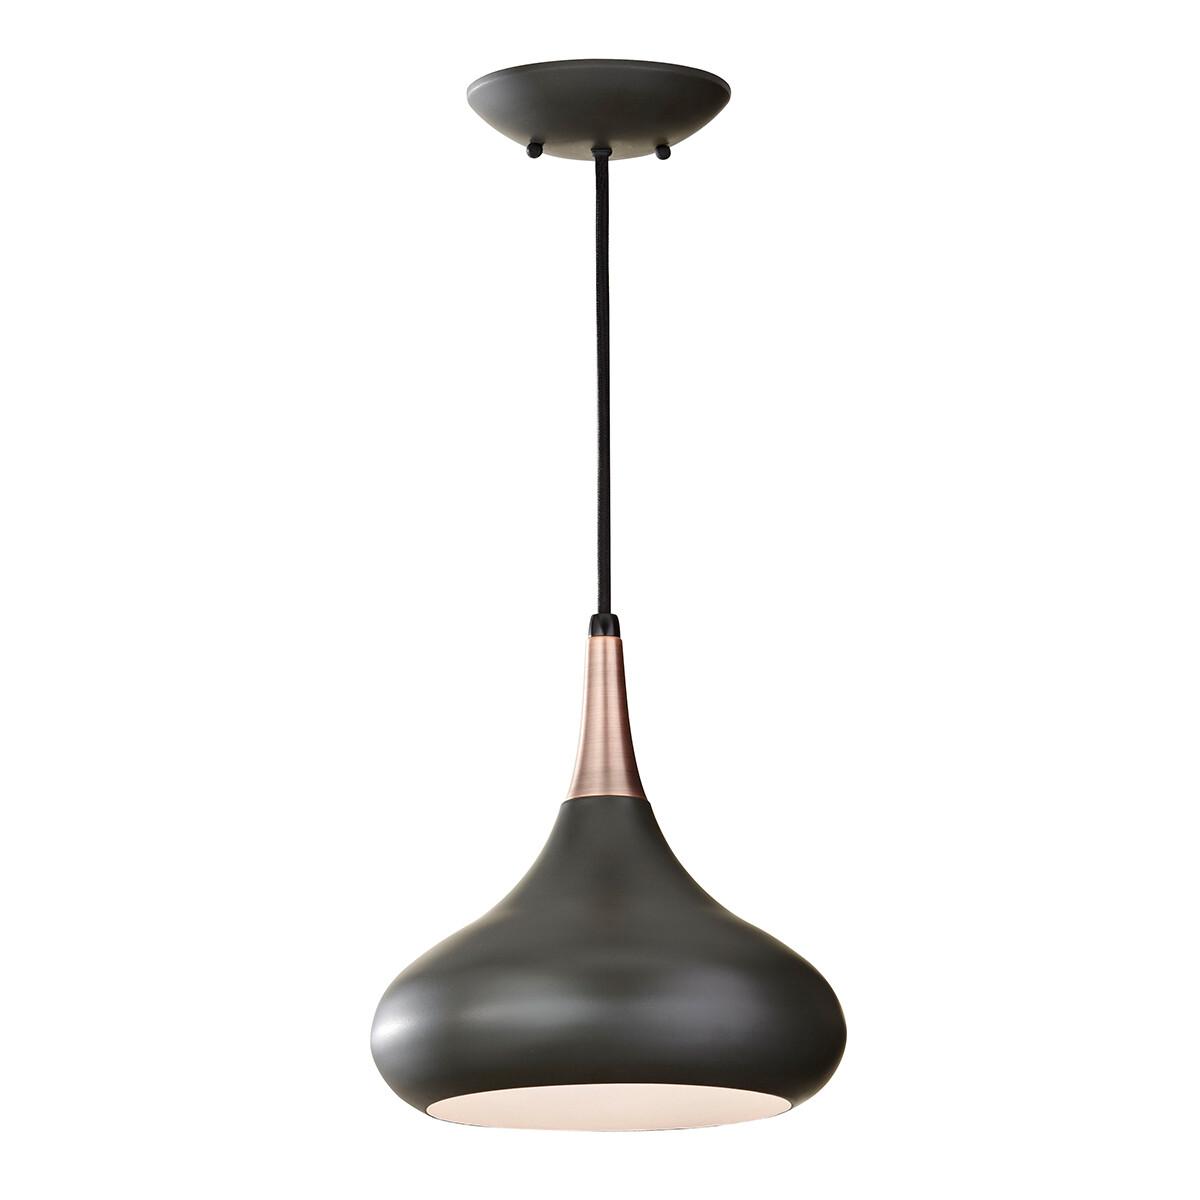 Feiss Beso 1 Light Medium Pendant – Dark Bronze